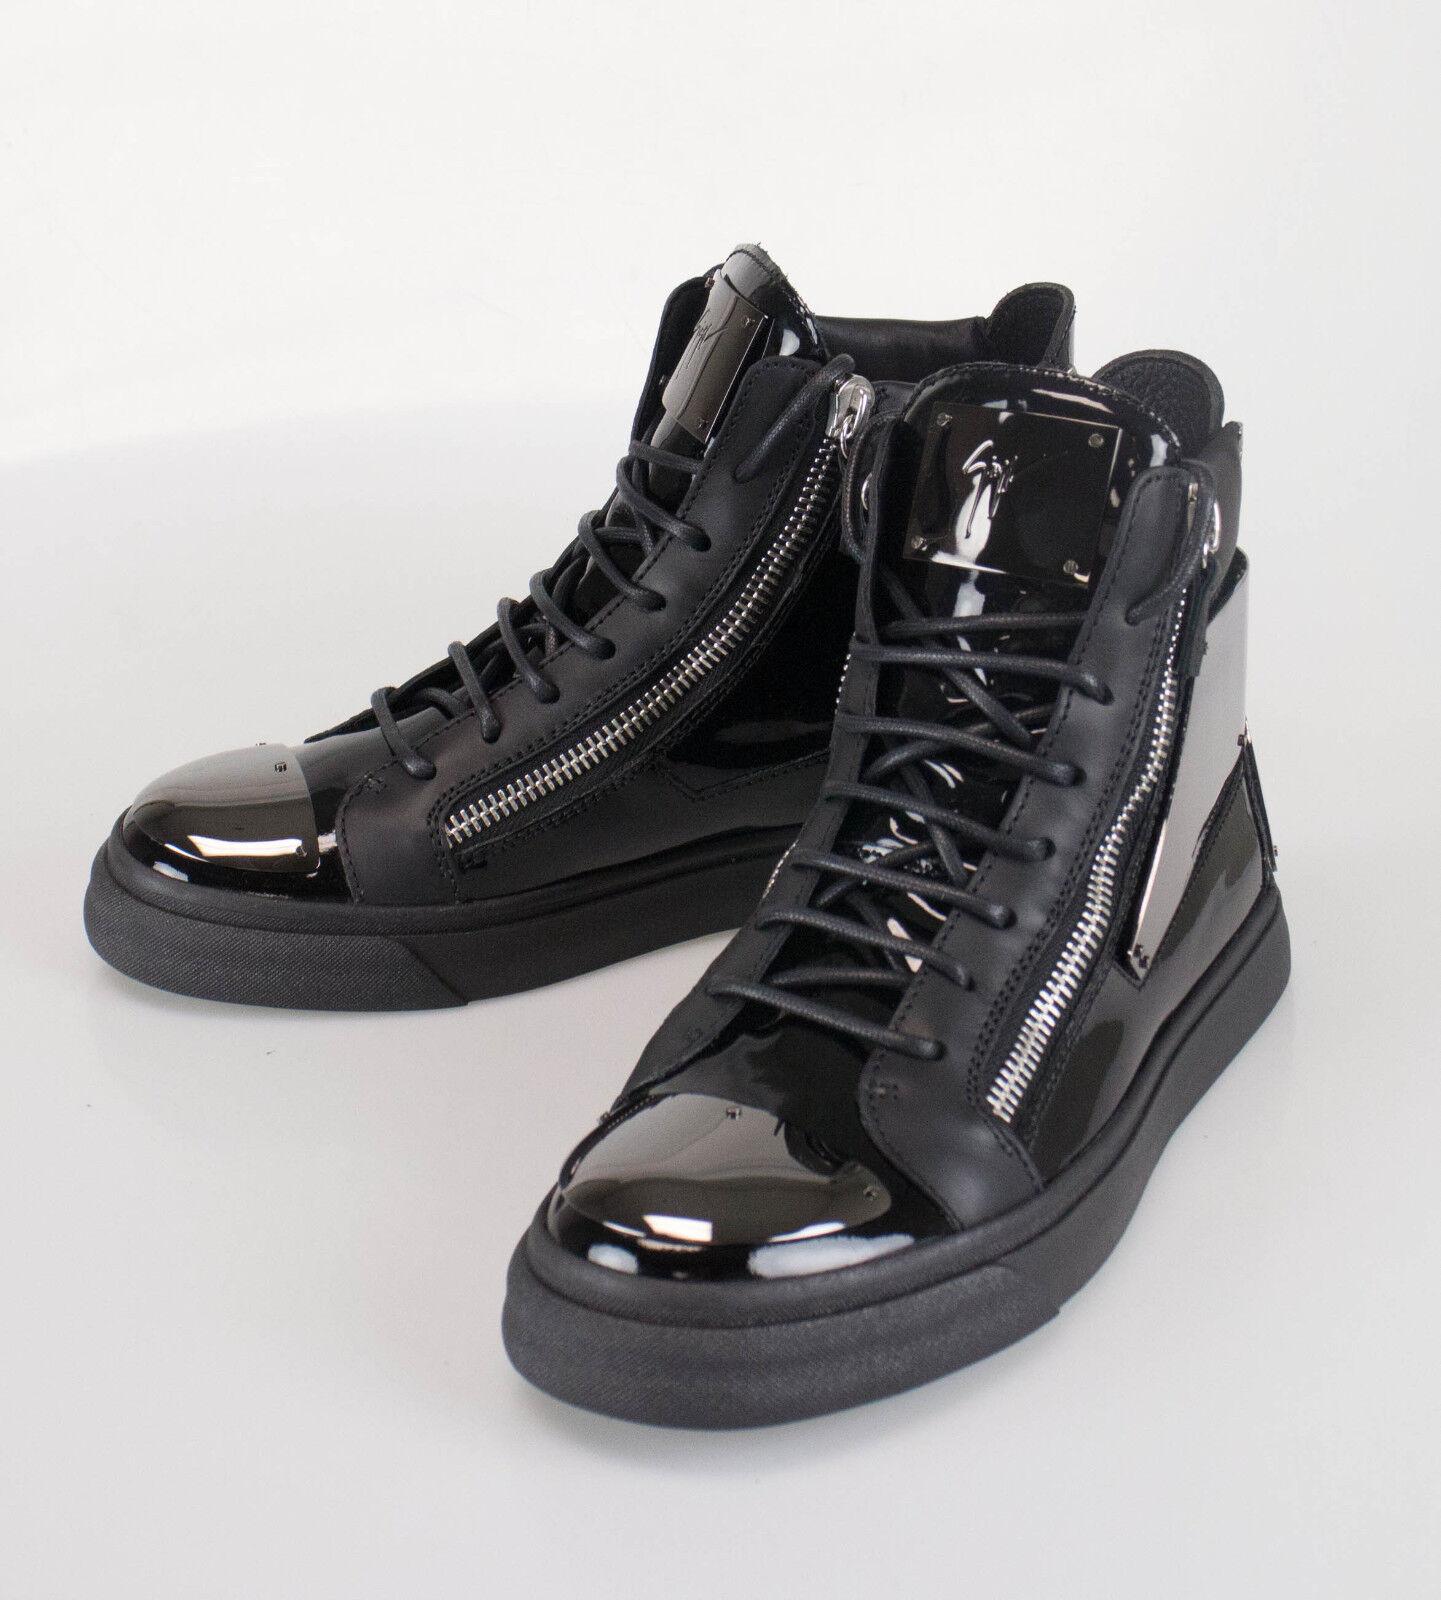 Nouveau. GIUSEPPE ZANOTTI London Vernice Hi-top baskets chaussures 7 US 40 EU 1325